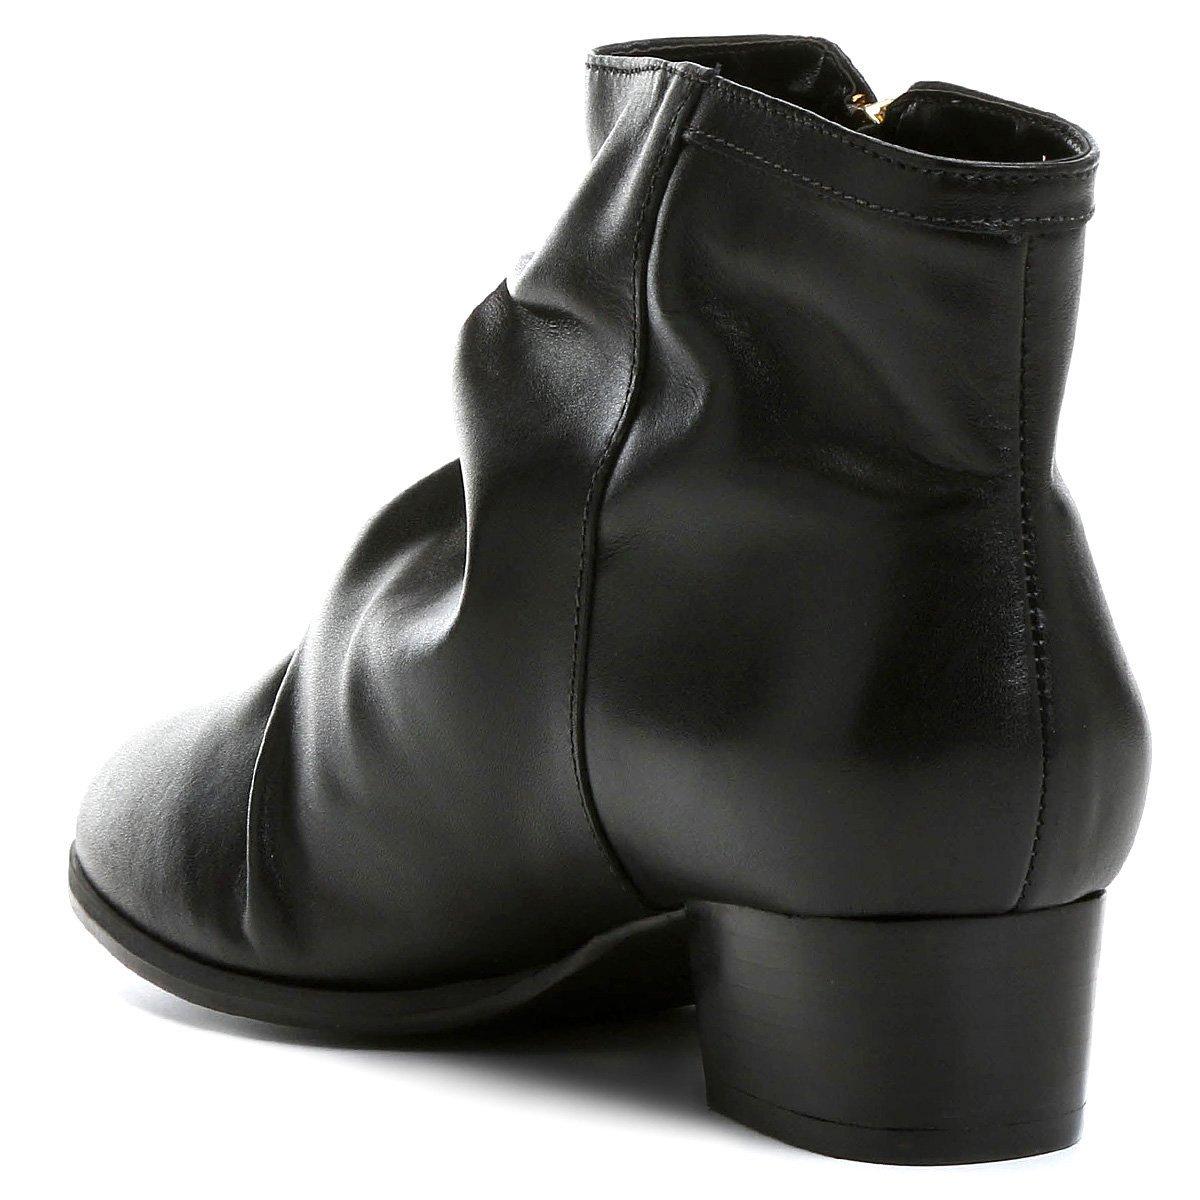 Feminina Enrugada Preto Bota Shoestock Bota Couro Couro Curta Z7YxYp